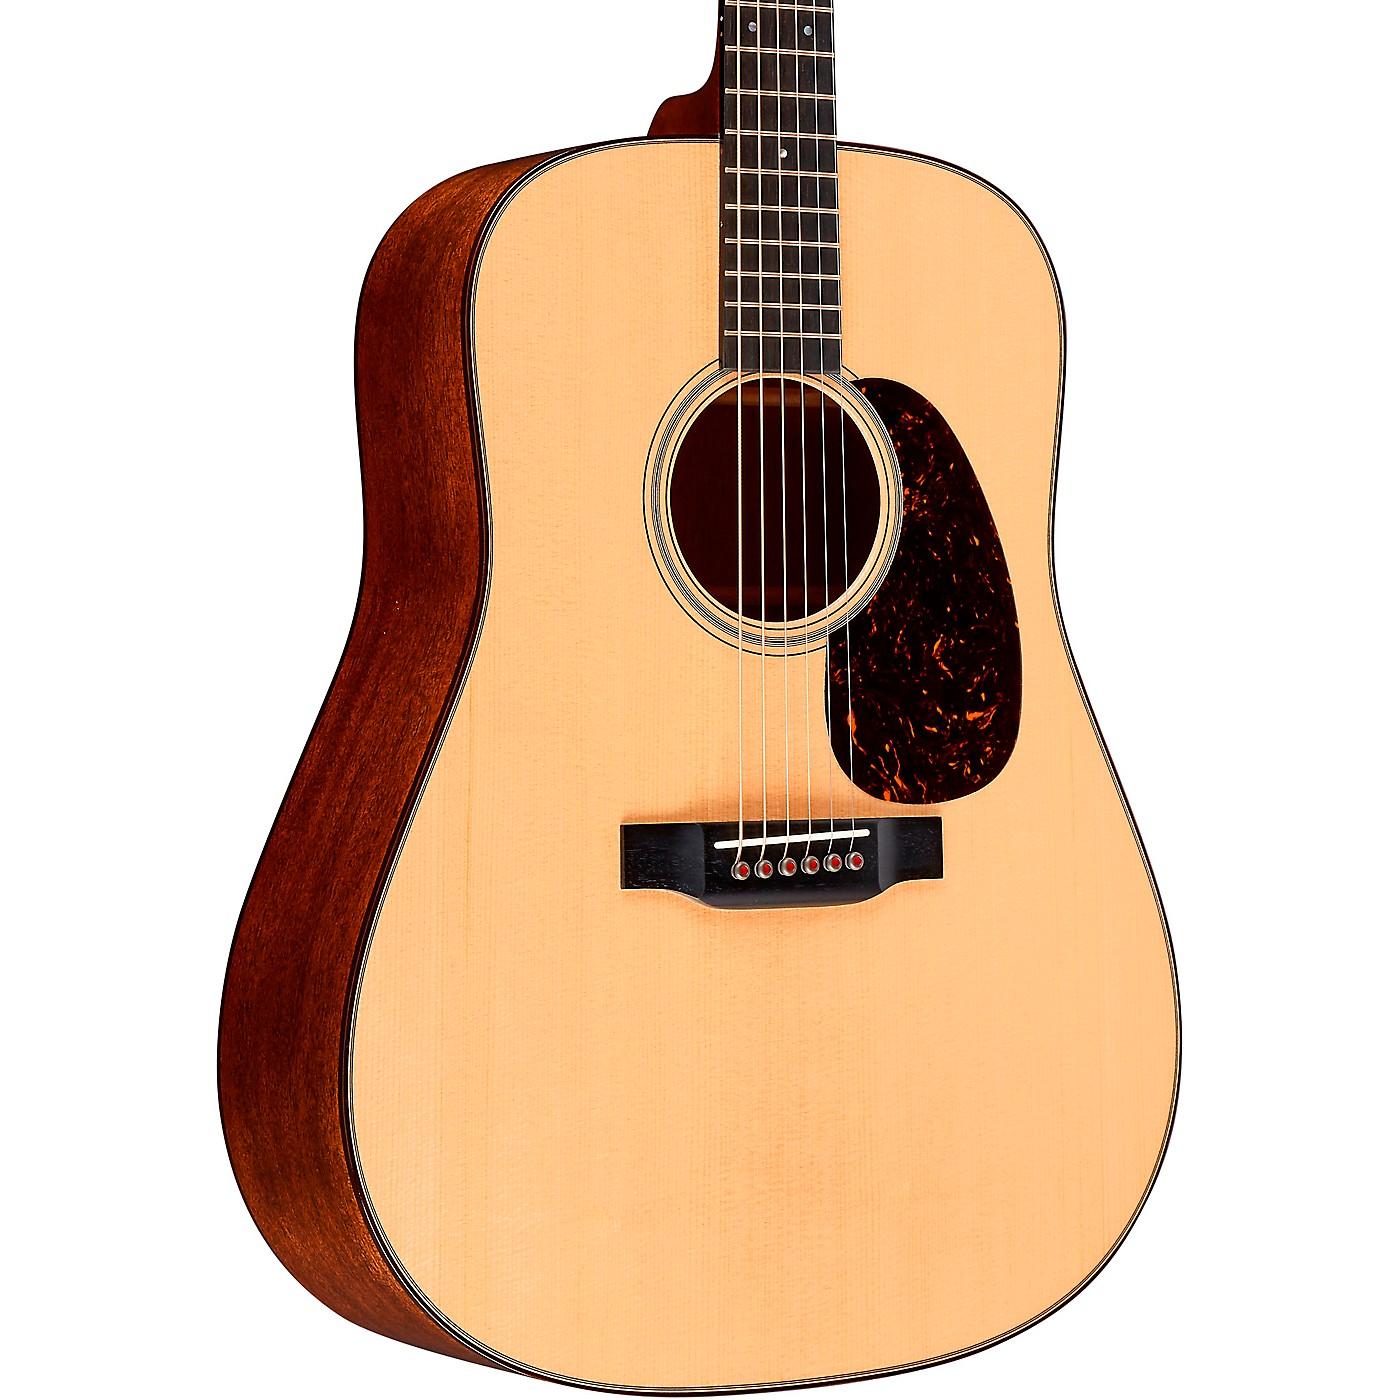 Martin D-18 Modern Deluxe Dreadnought Acoustic Guitar thumbnail